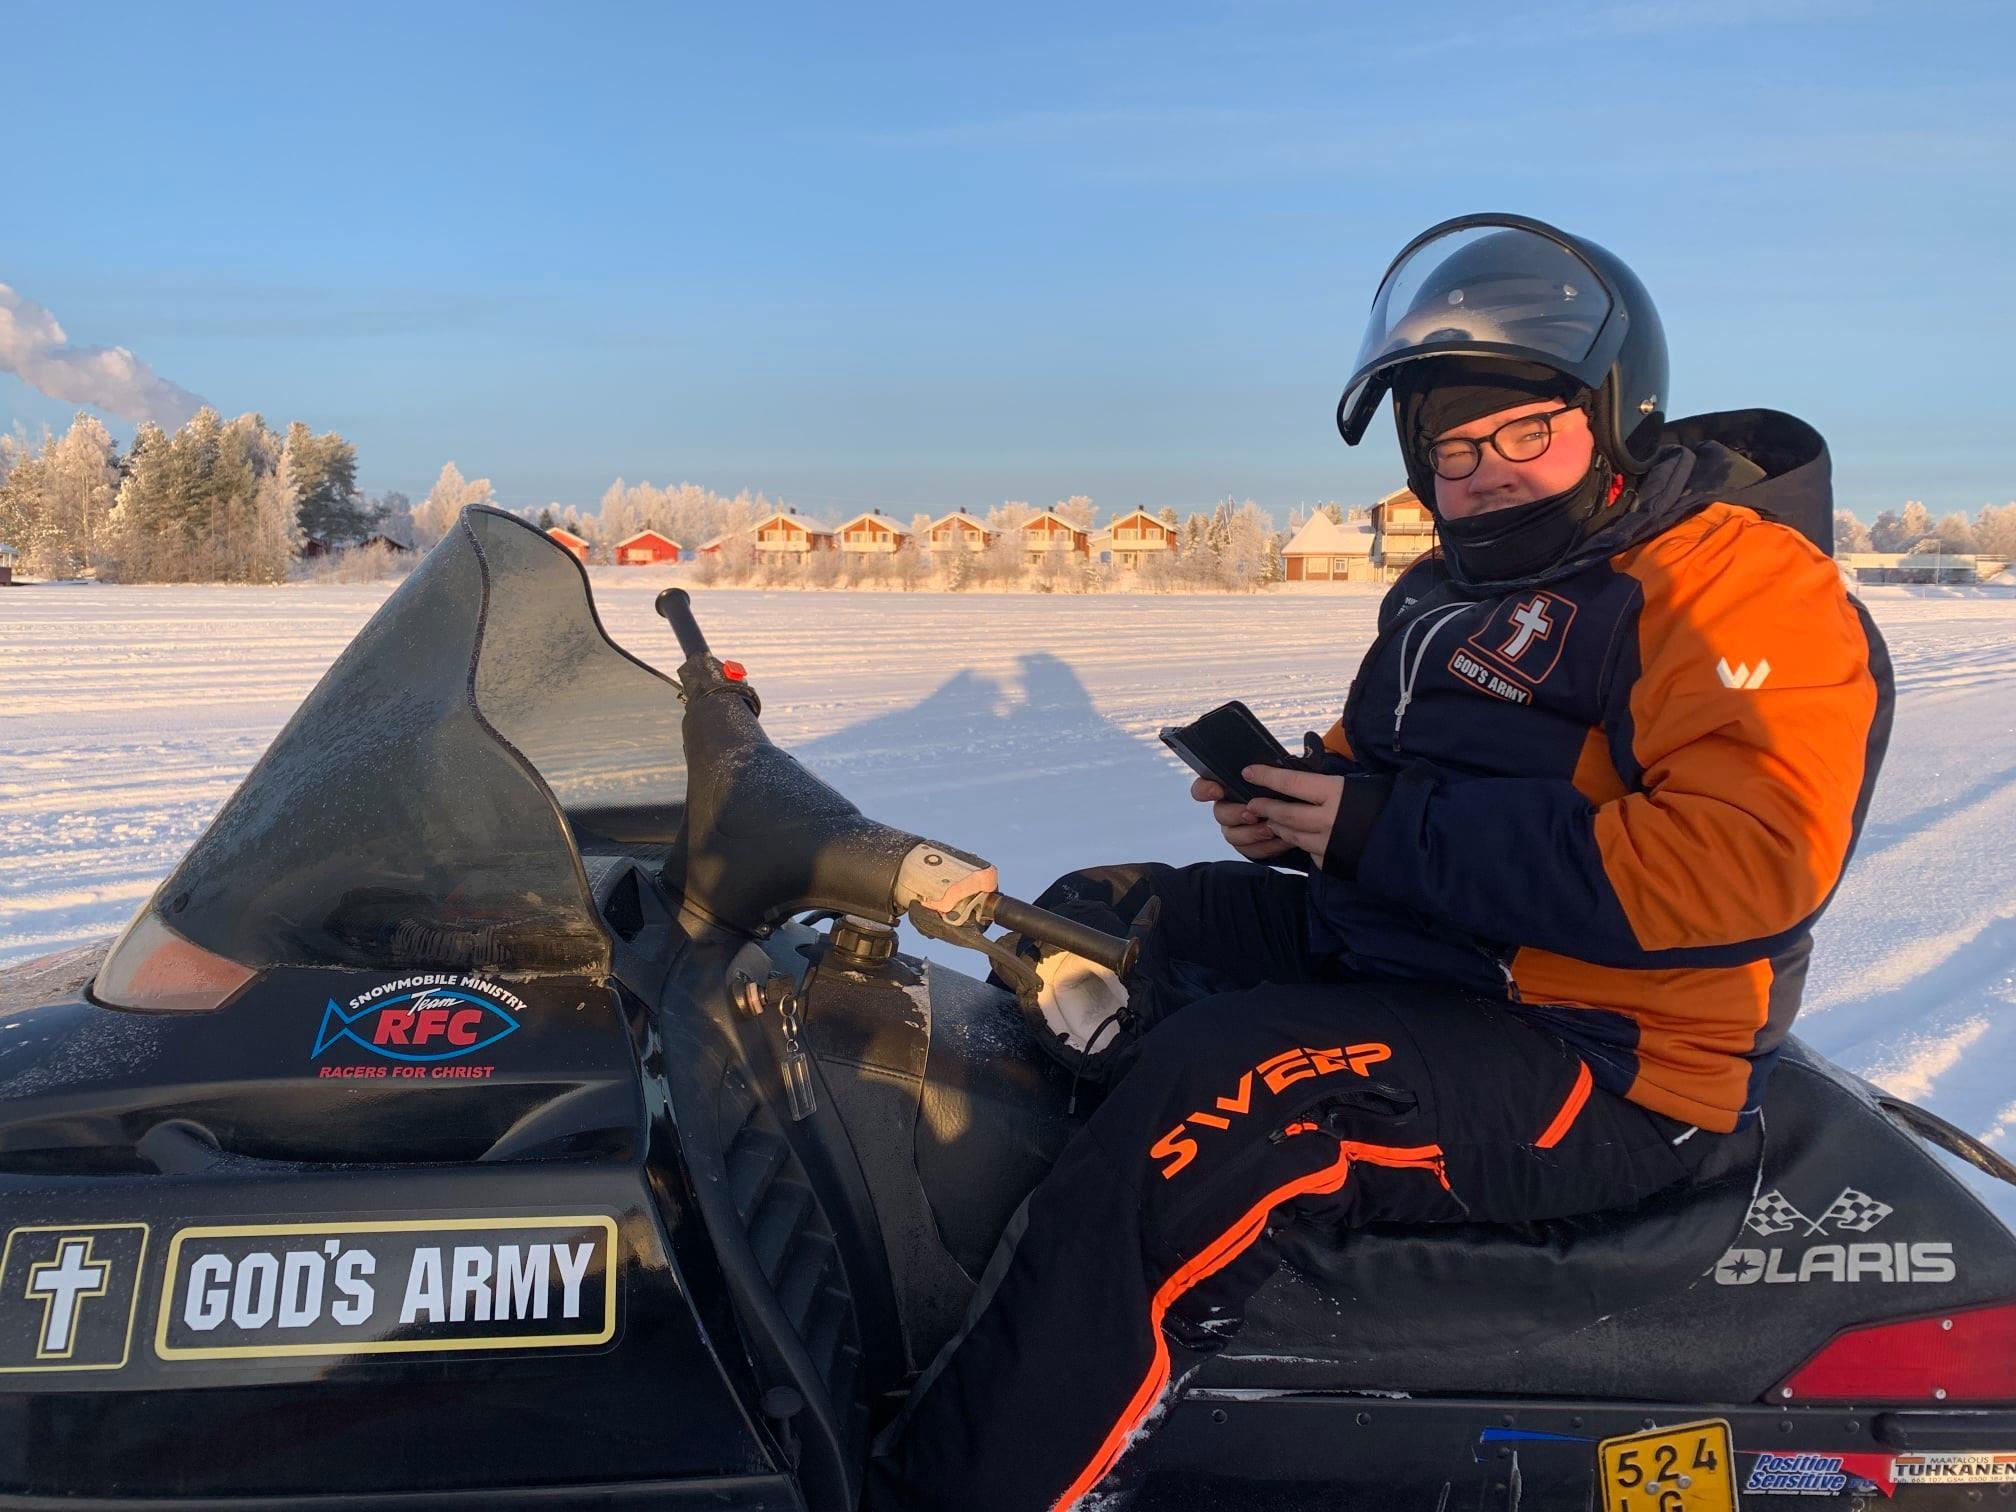 Field staff Johann Sebastian rides a snow mobile as he seeks to serve others.